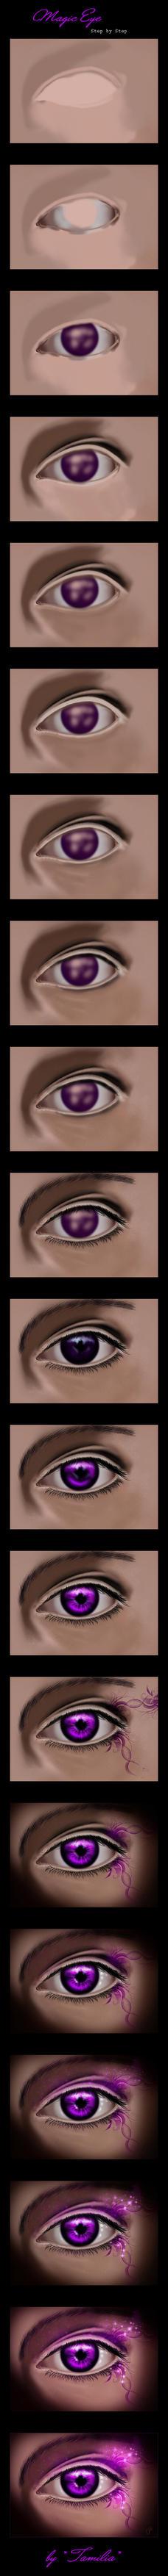 Magic Eye Step by Step by Tamilia